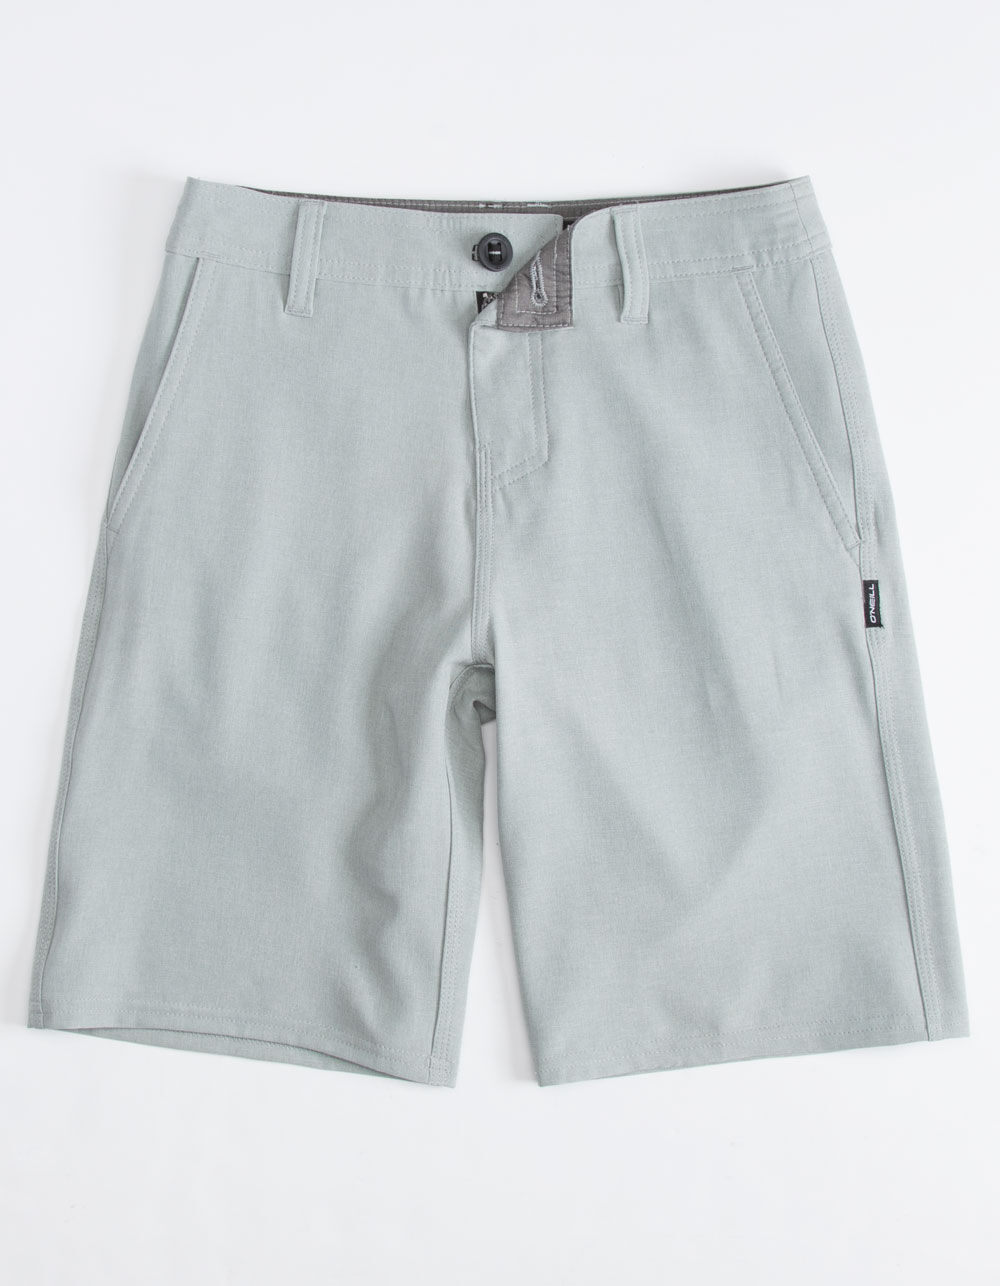 O'NEILL Reserve Light Gray Boys Hybrid Shorts